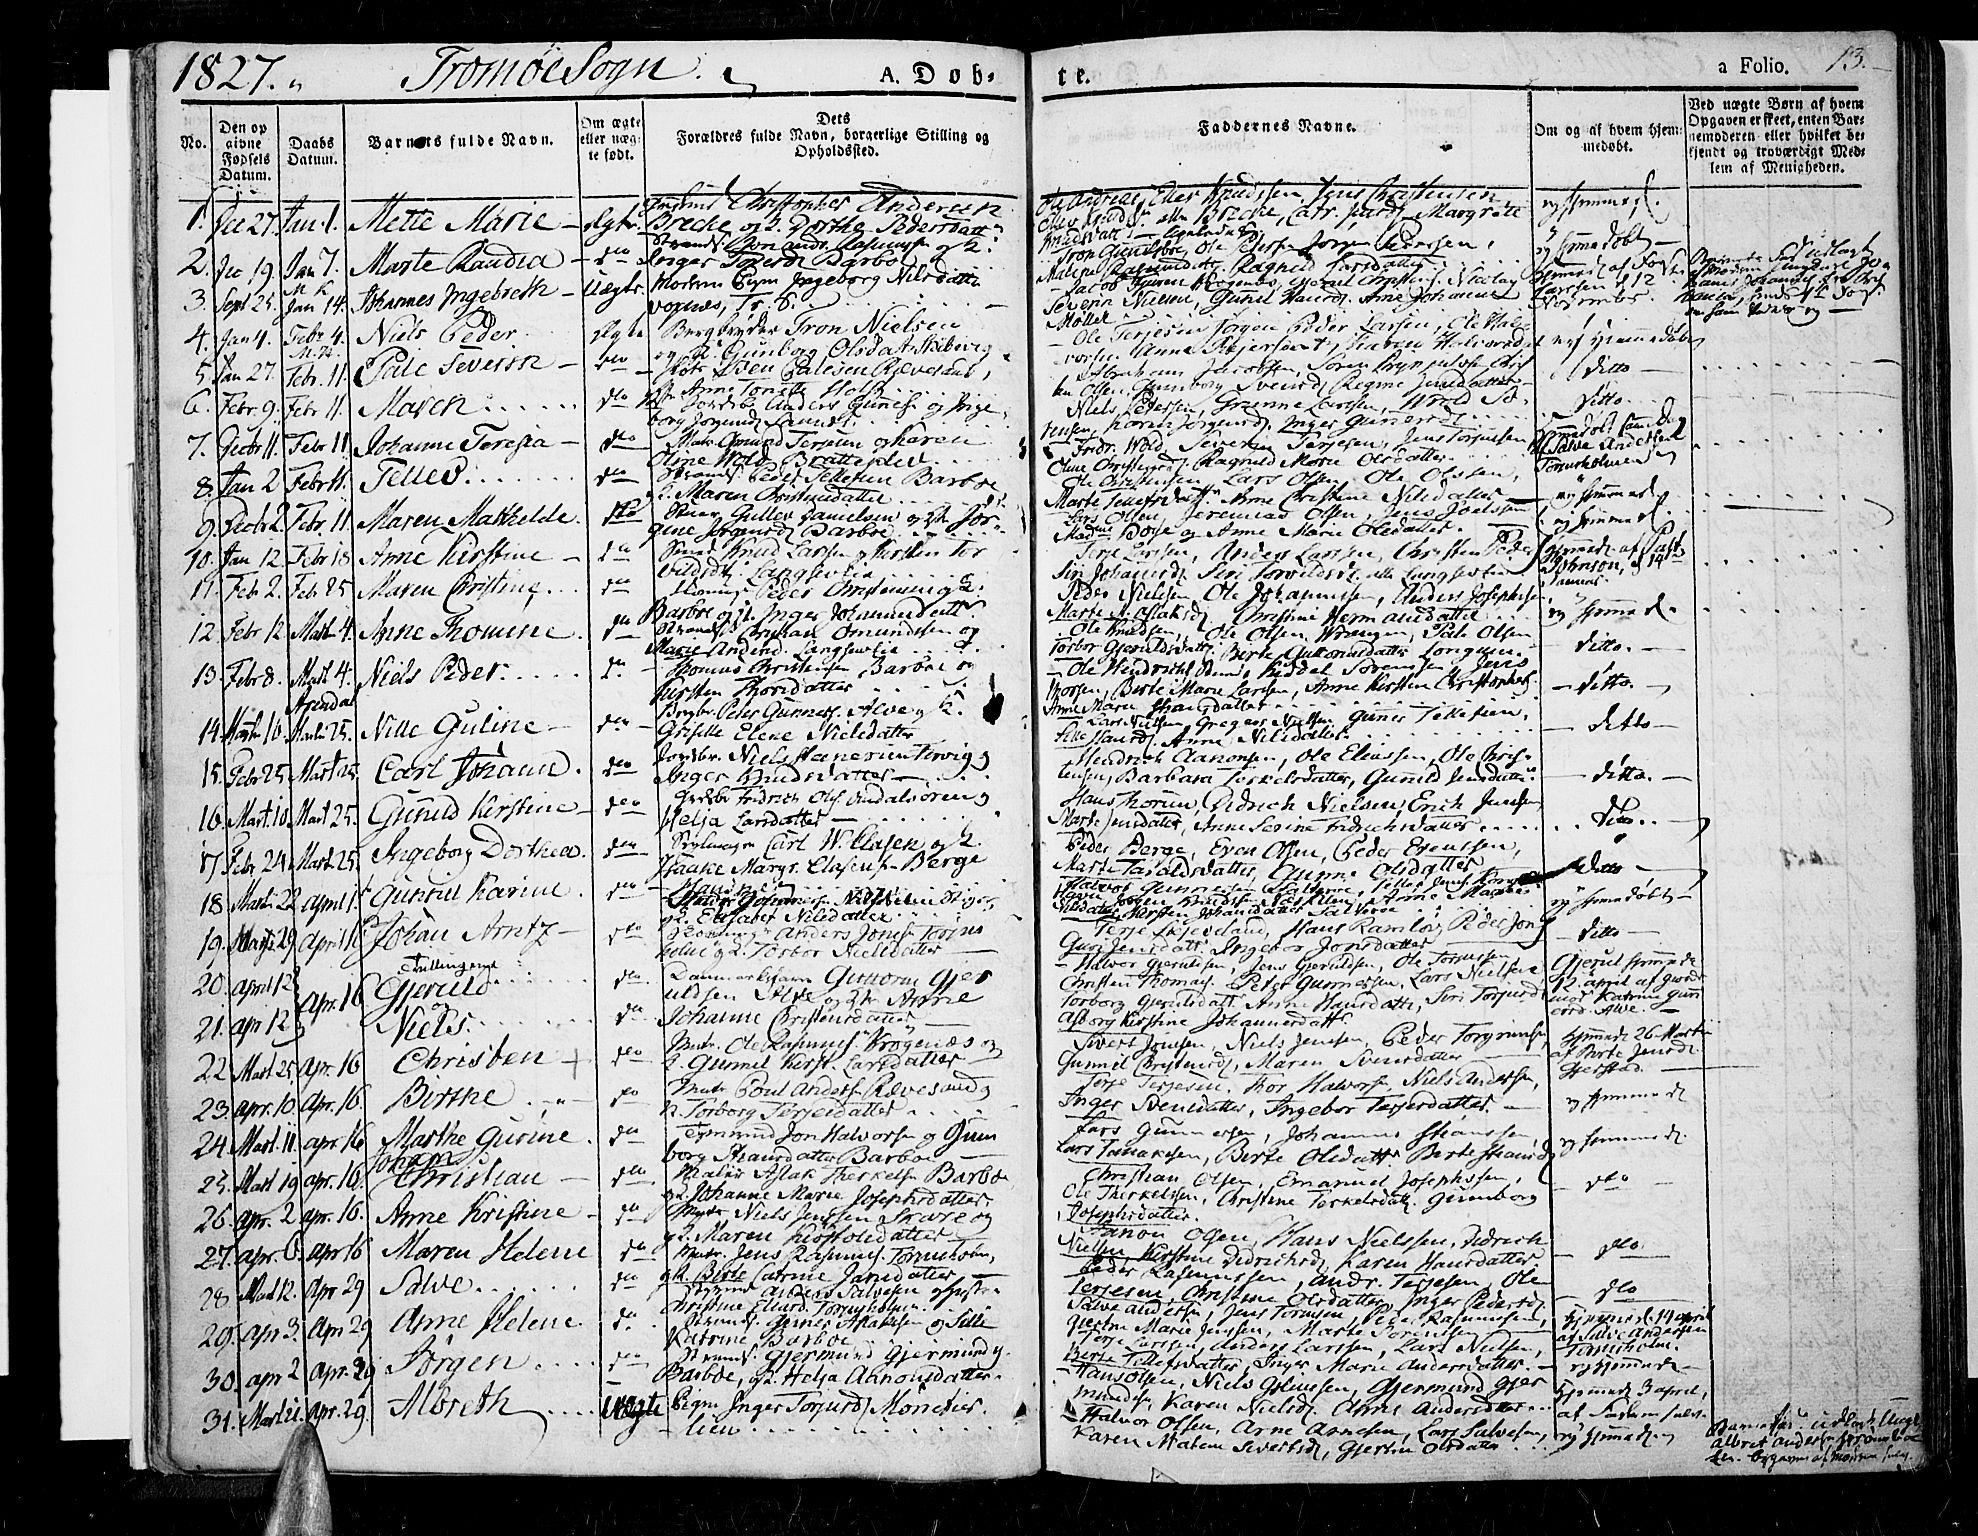 SAK, Tromøy sokneprestkontor, F/Fa/L0003: Ministerialbok nr. A 3, 1825-1837, s. 13